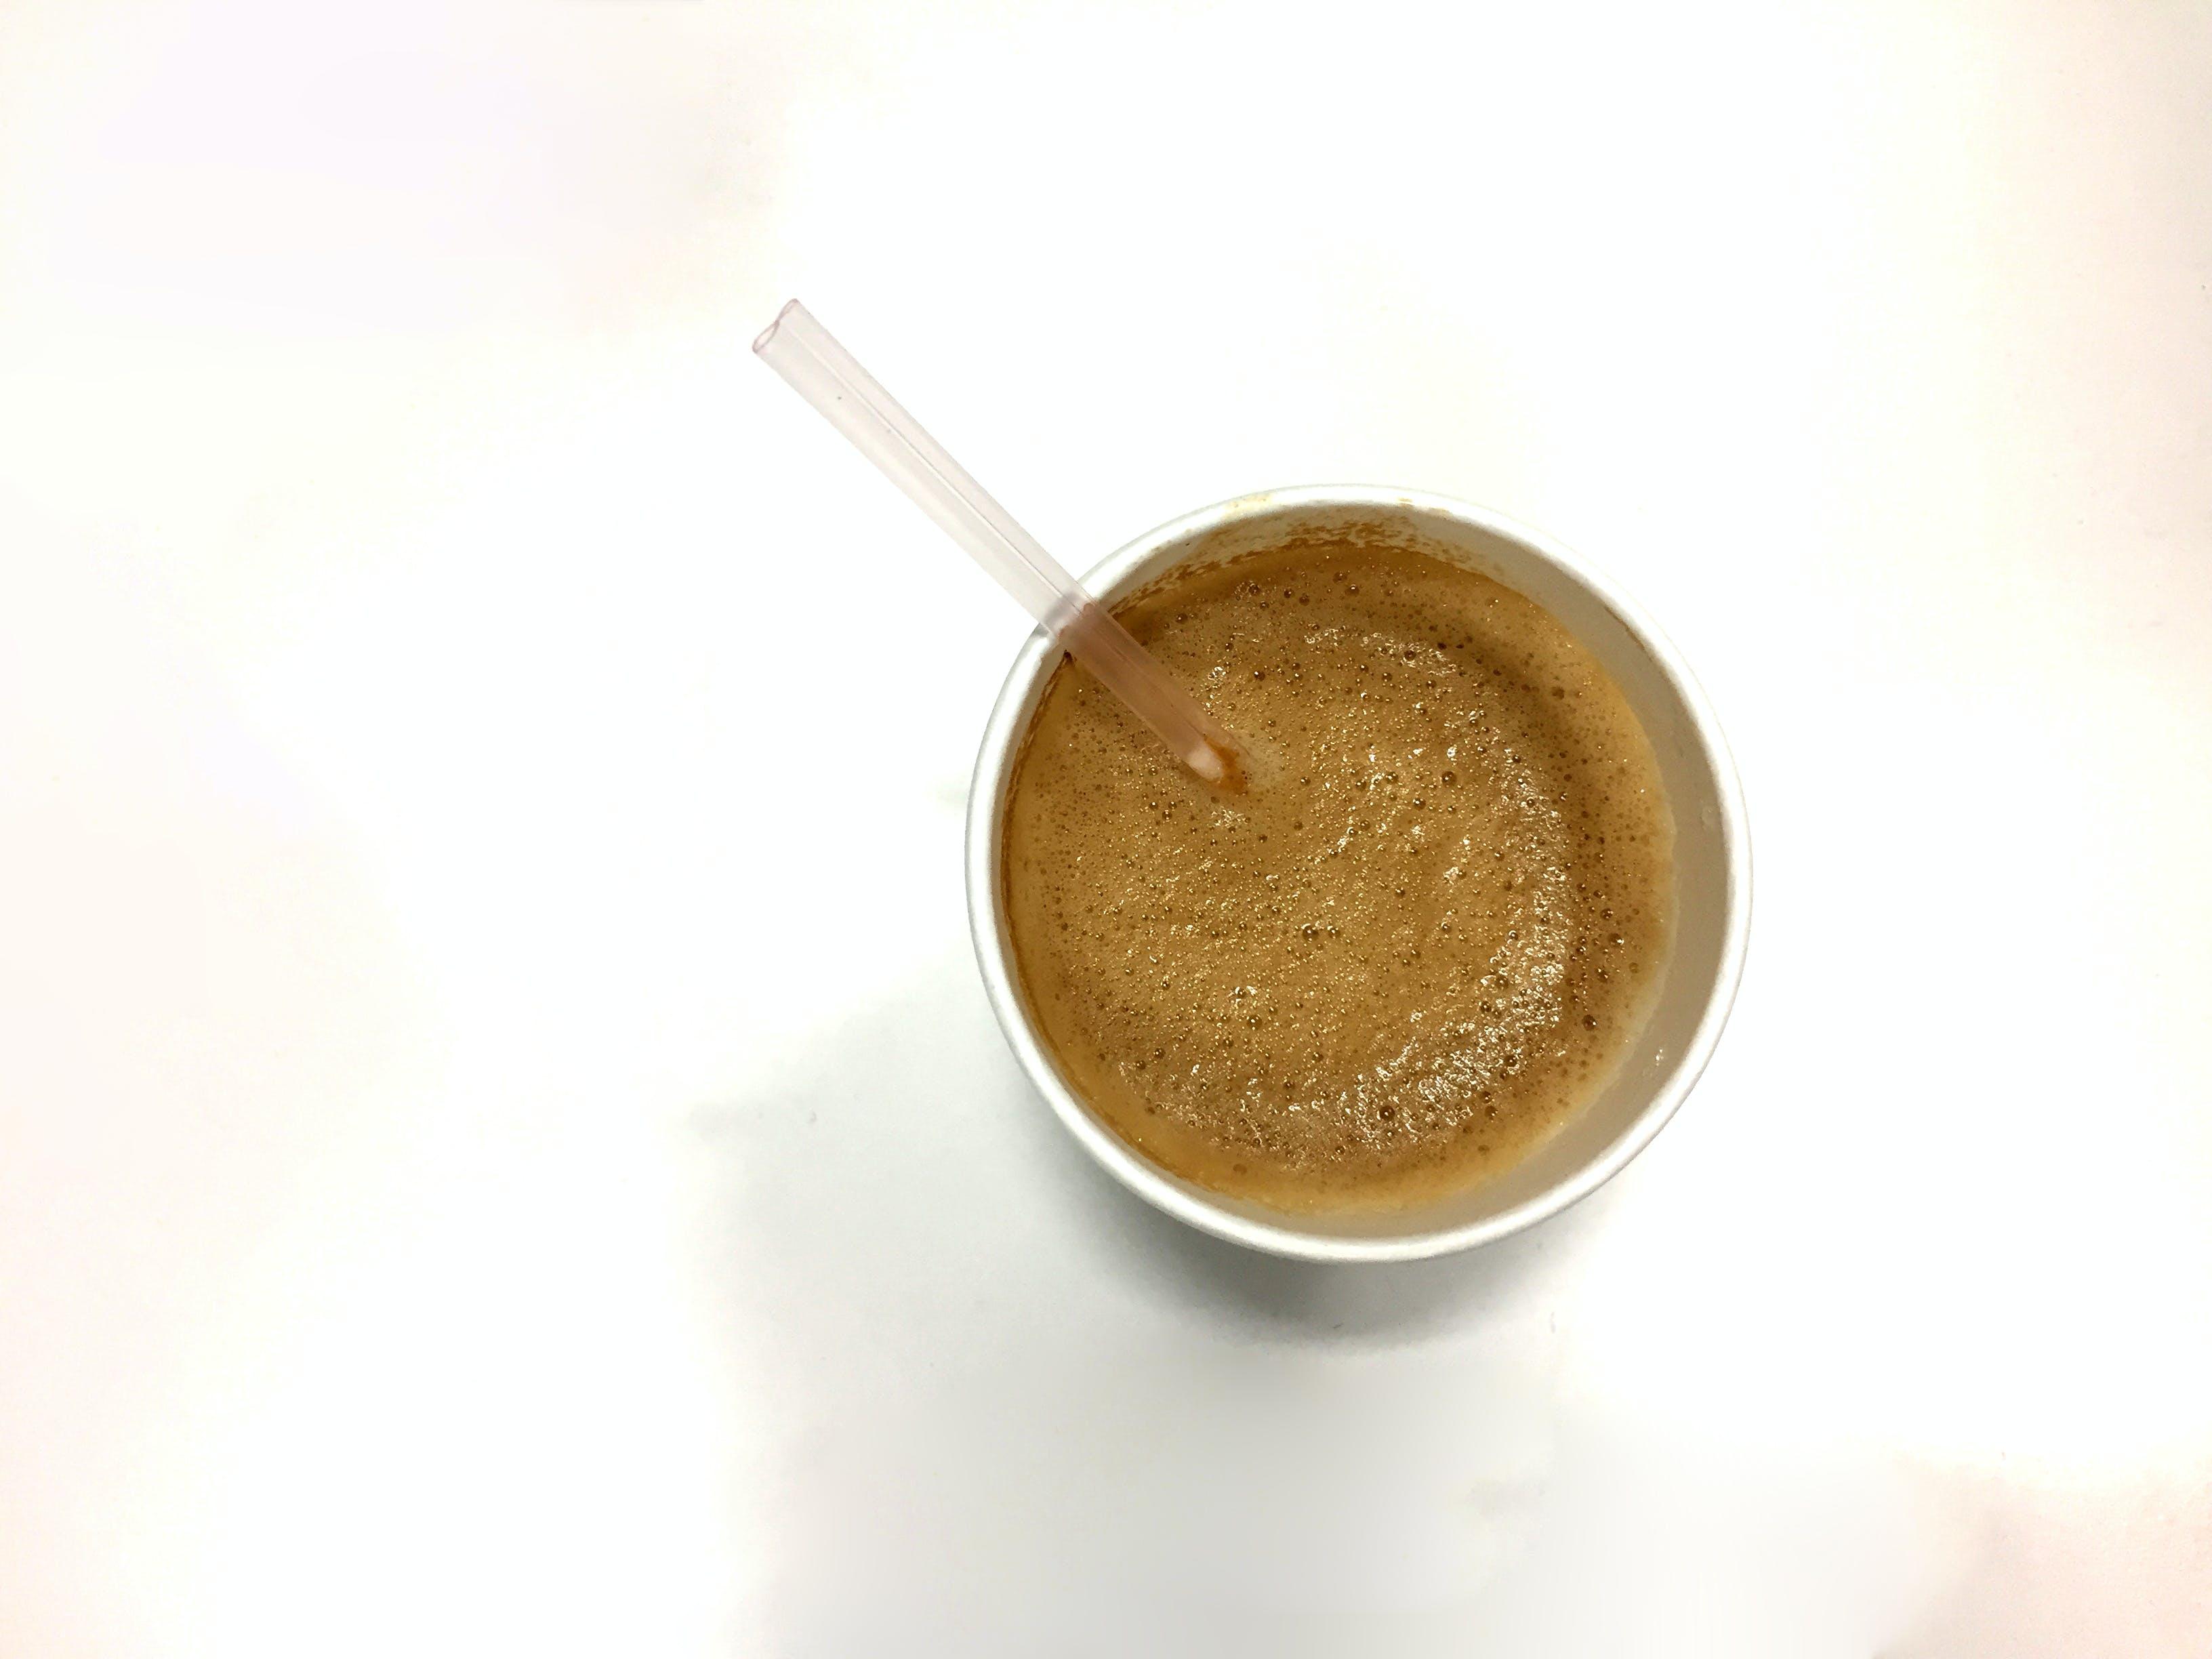 Kostenloses Stock Foto zu kaffee, kaffeetasse, tasse, tasse kaffee